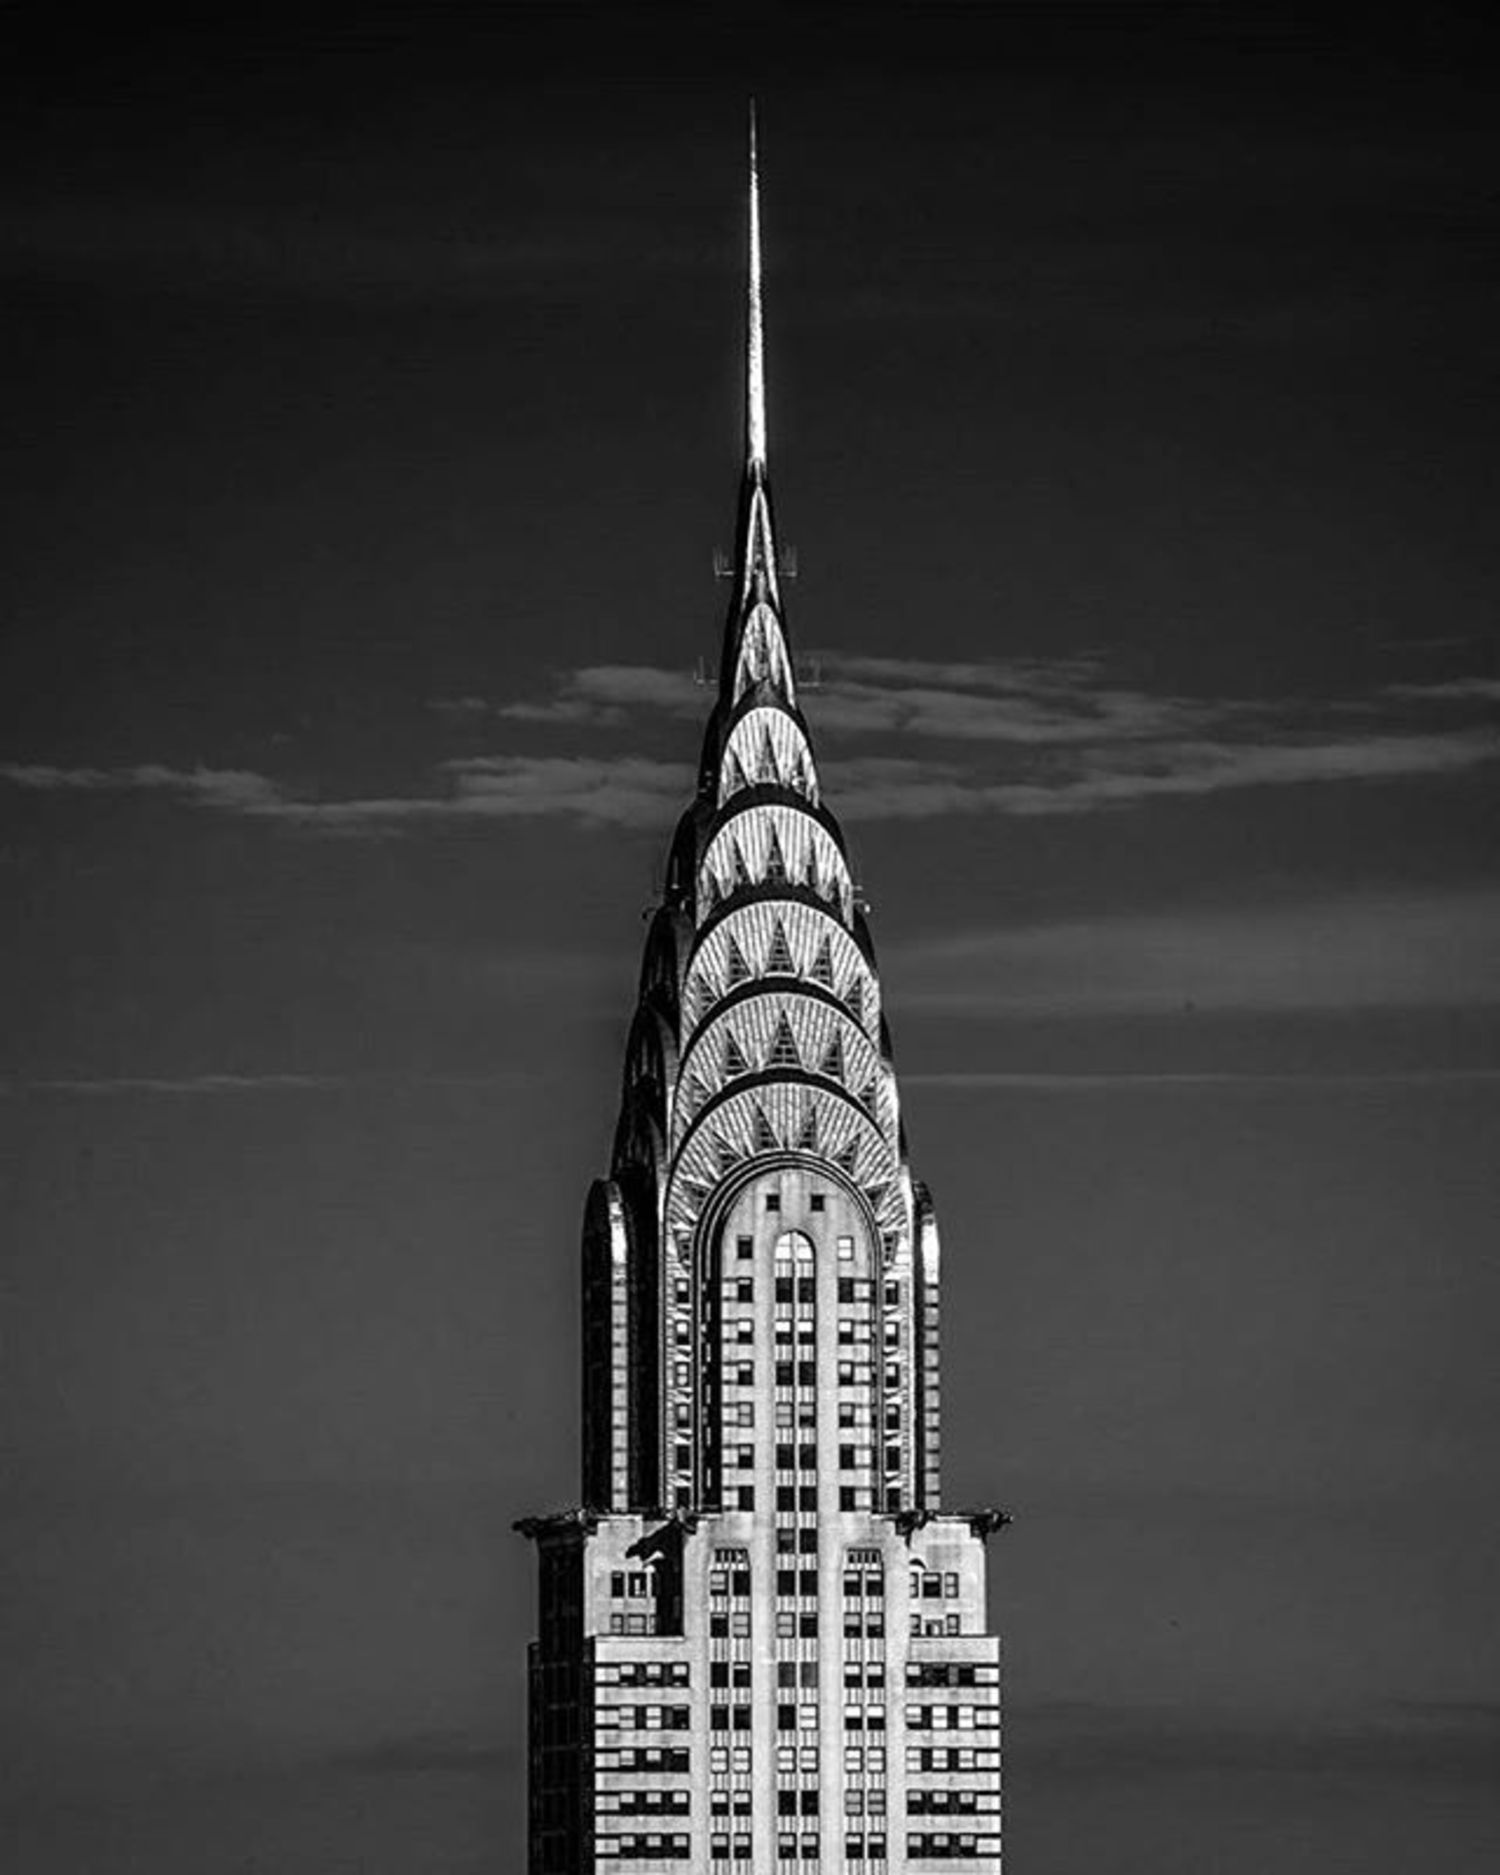 Chrysler Building, New York, New York. Photo via @m_bautista330 #viewingnyc #newyork #newyorkcity #nyc